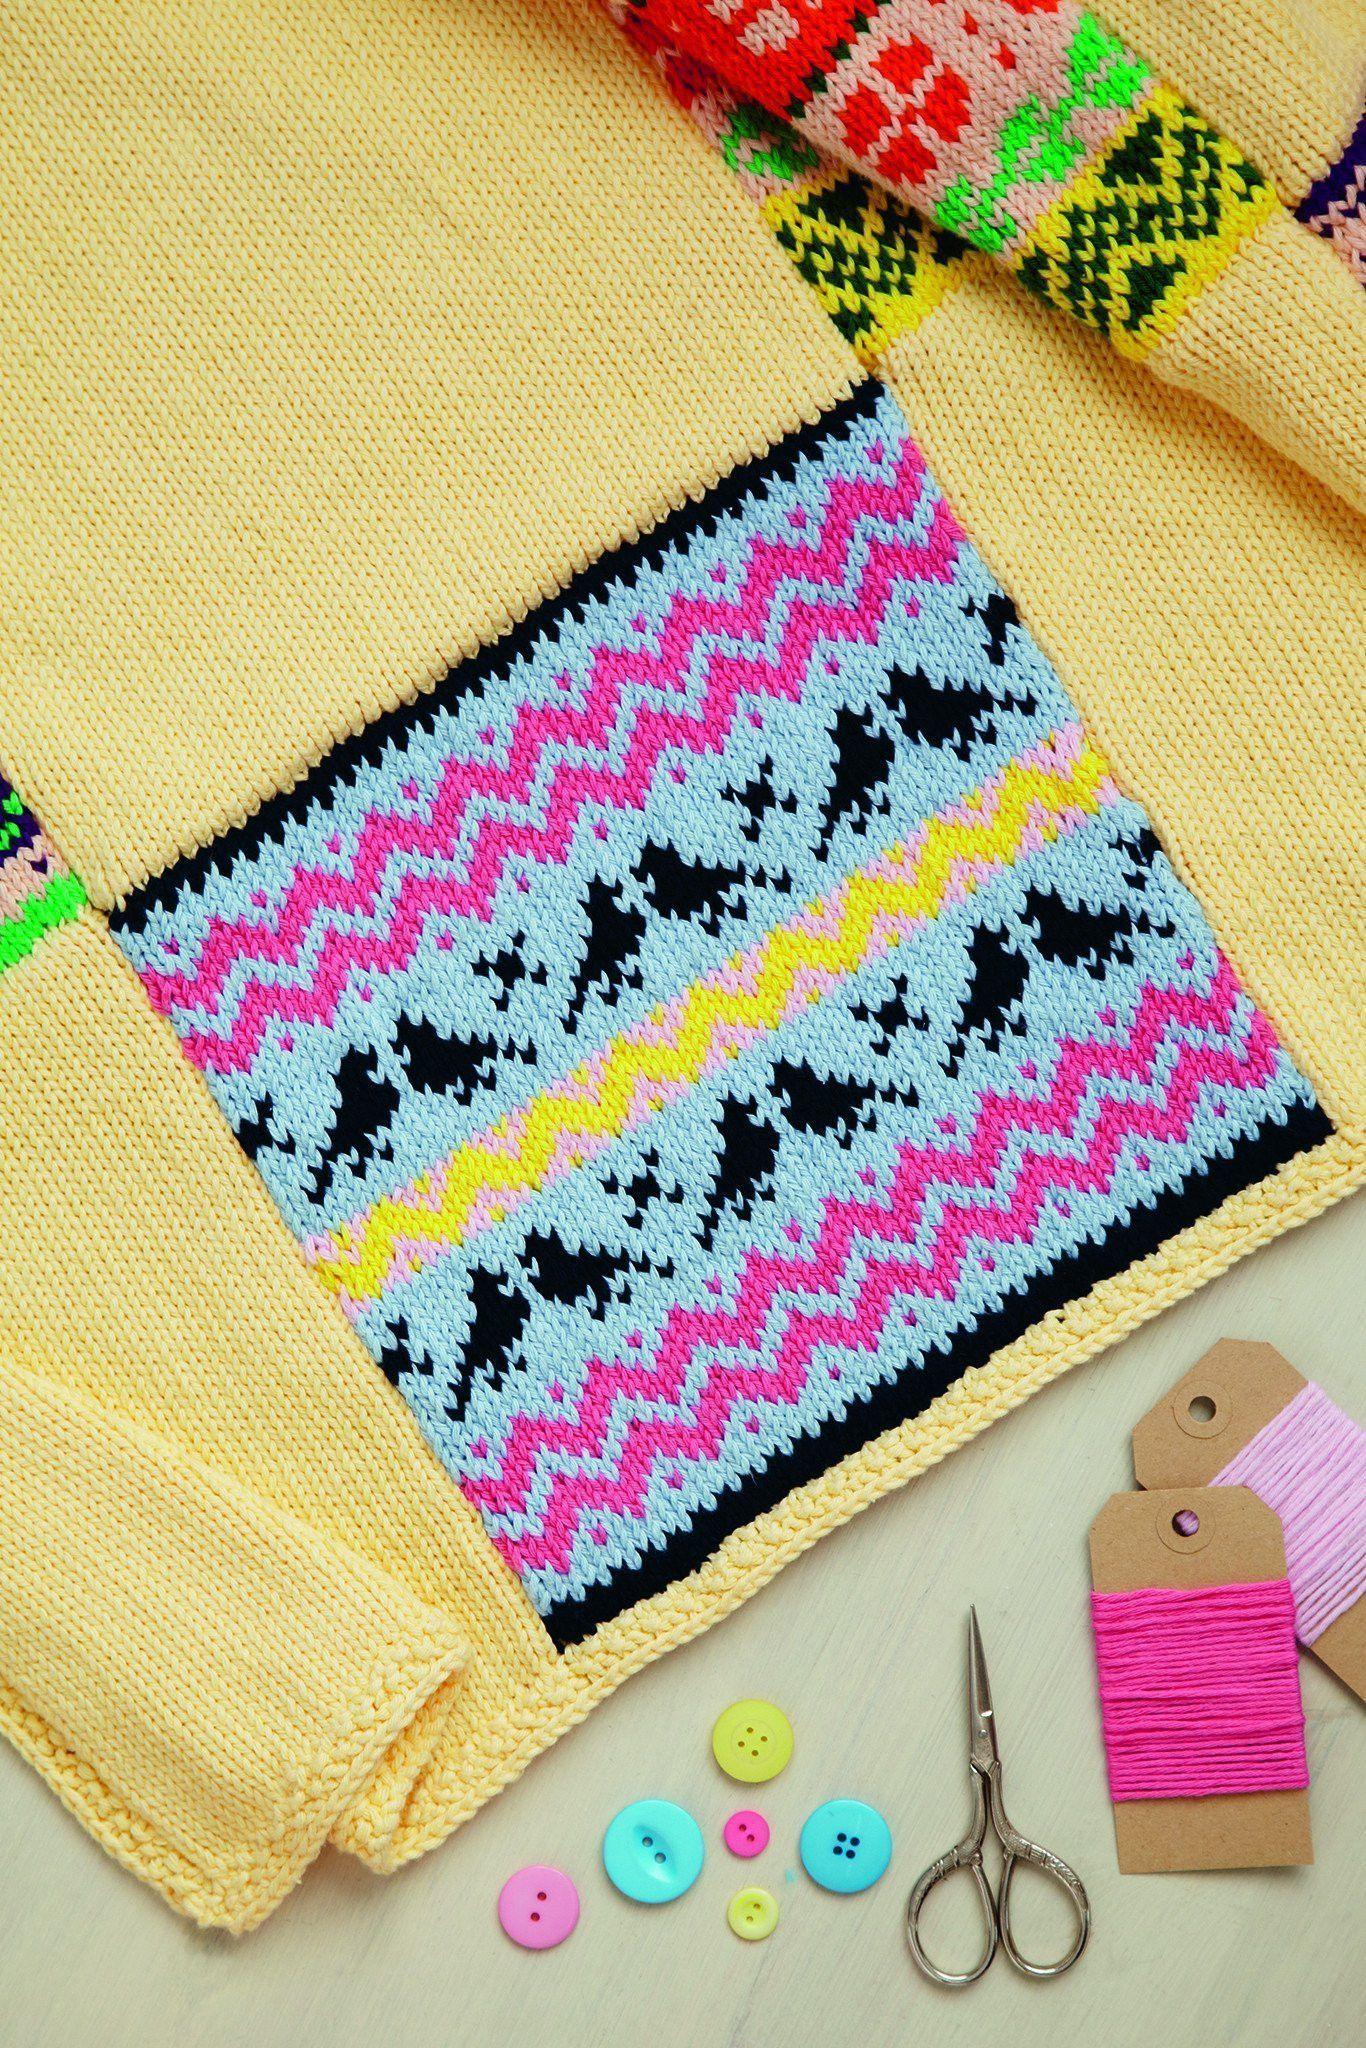 Fair Isle Square Blanket Knitting Pattern The Knitting